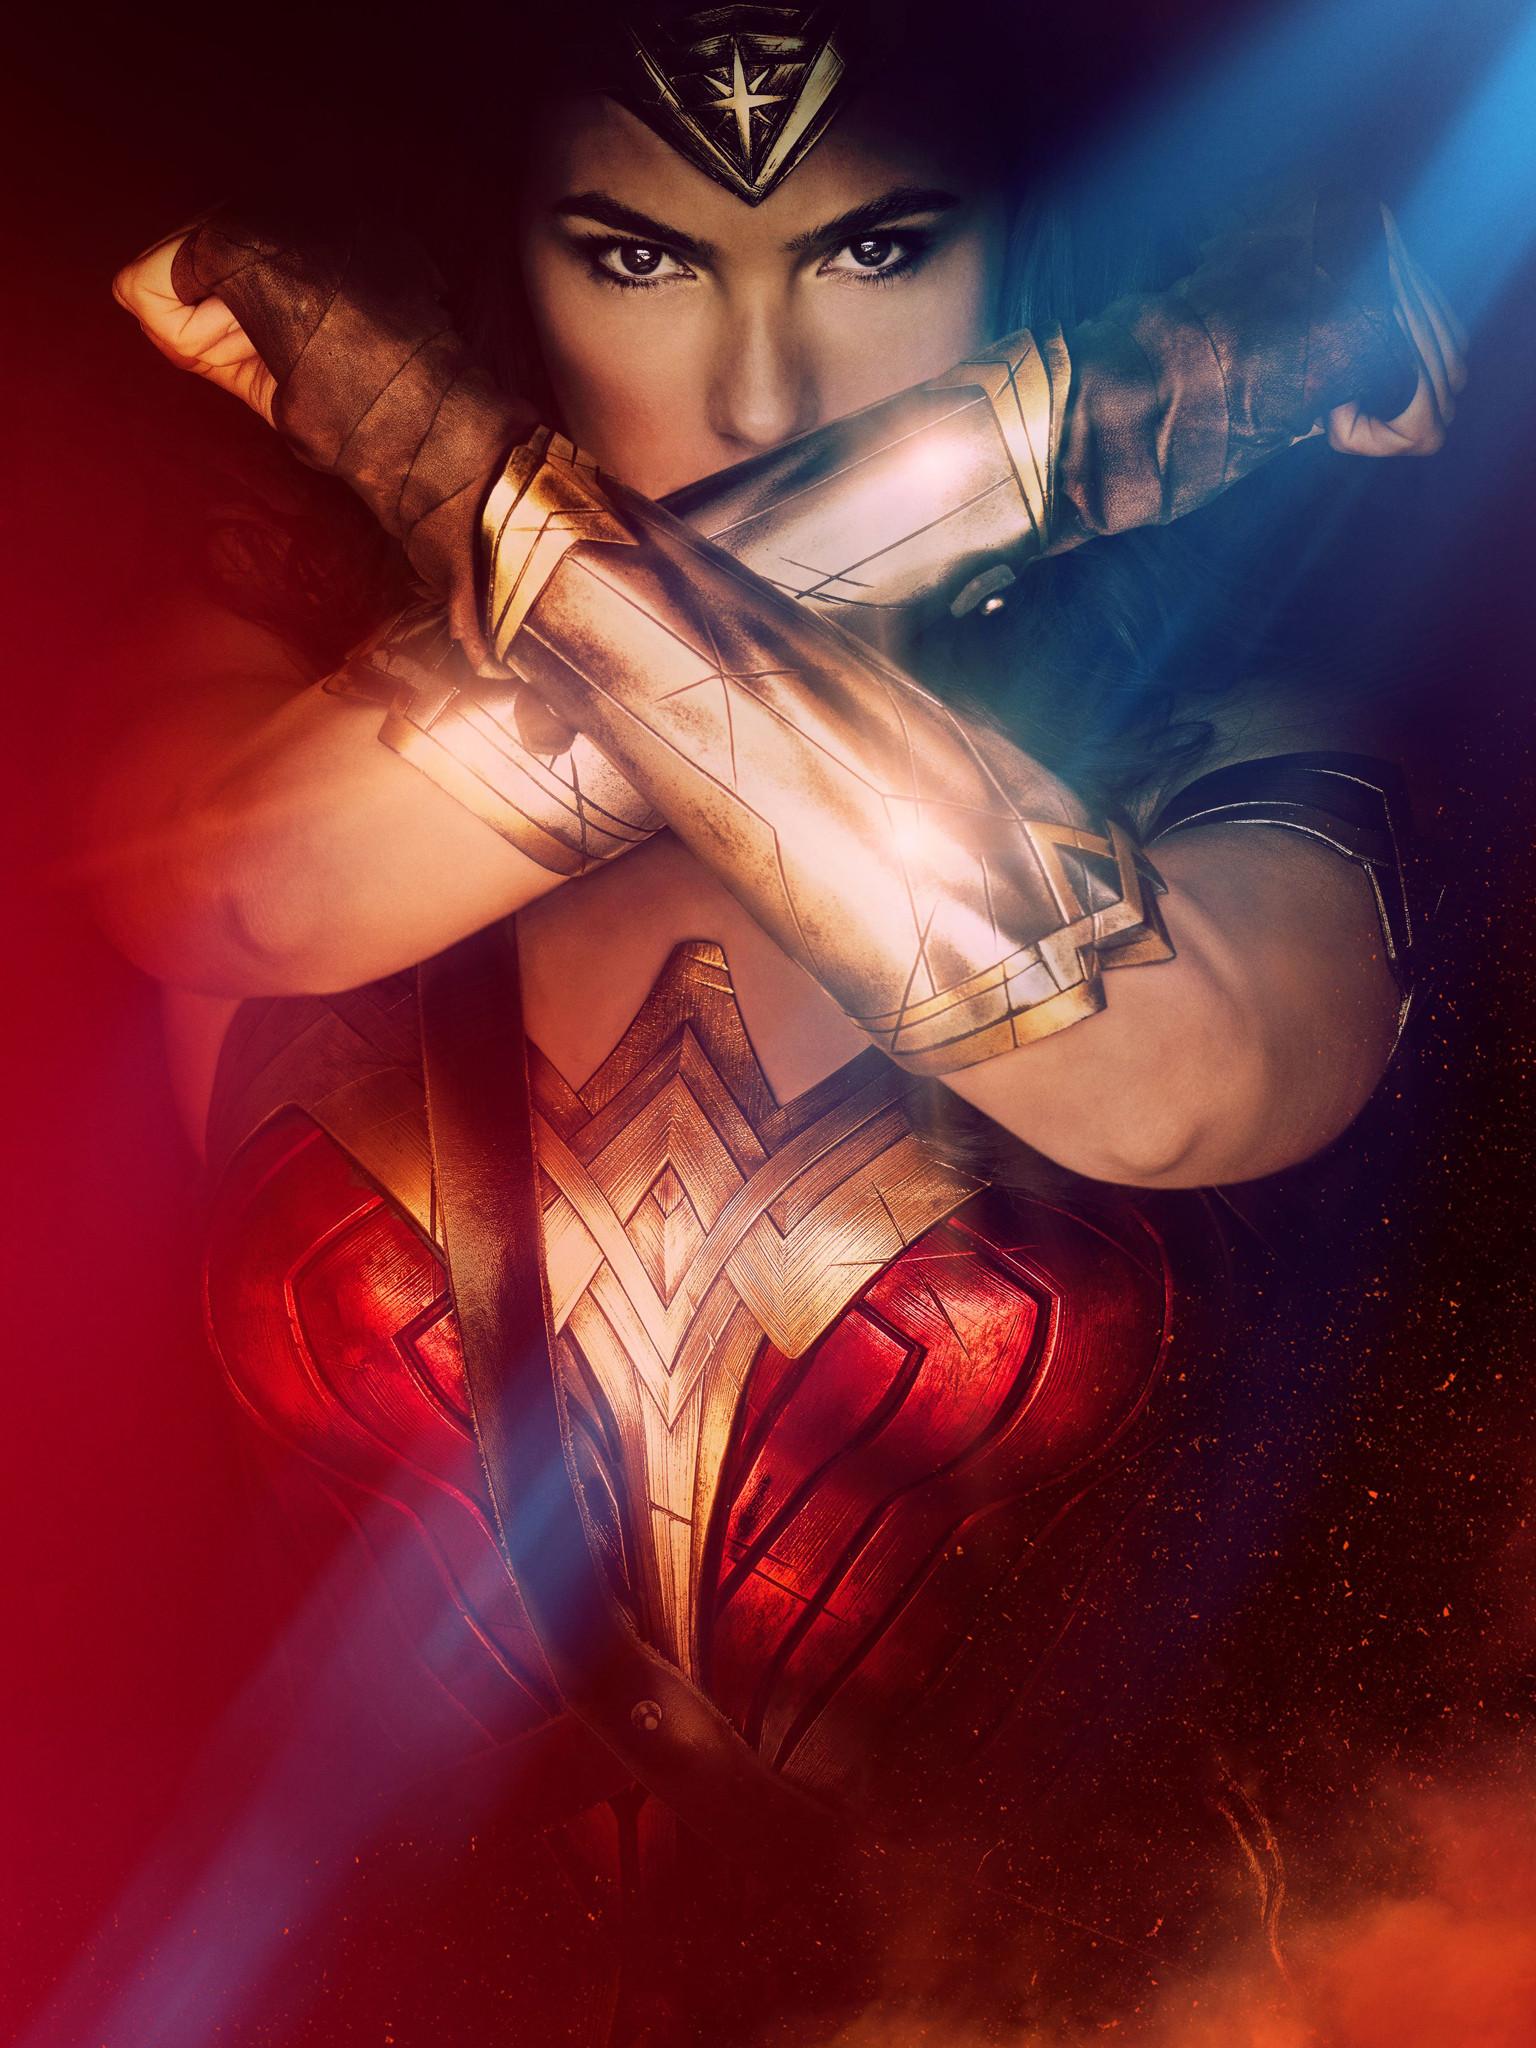 Wallpaper Wonder Woman Dc Comics Diana Gal Gadot